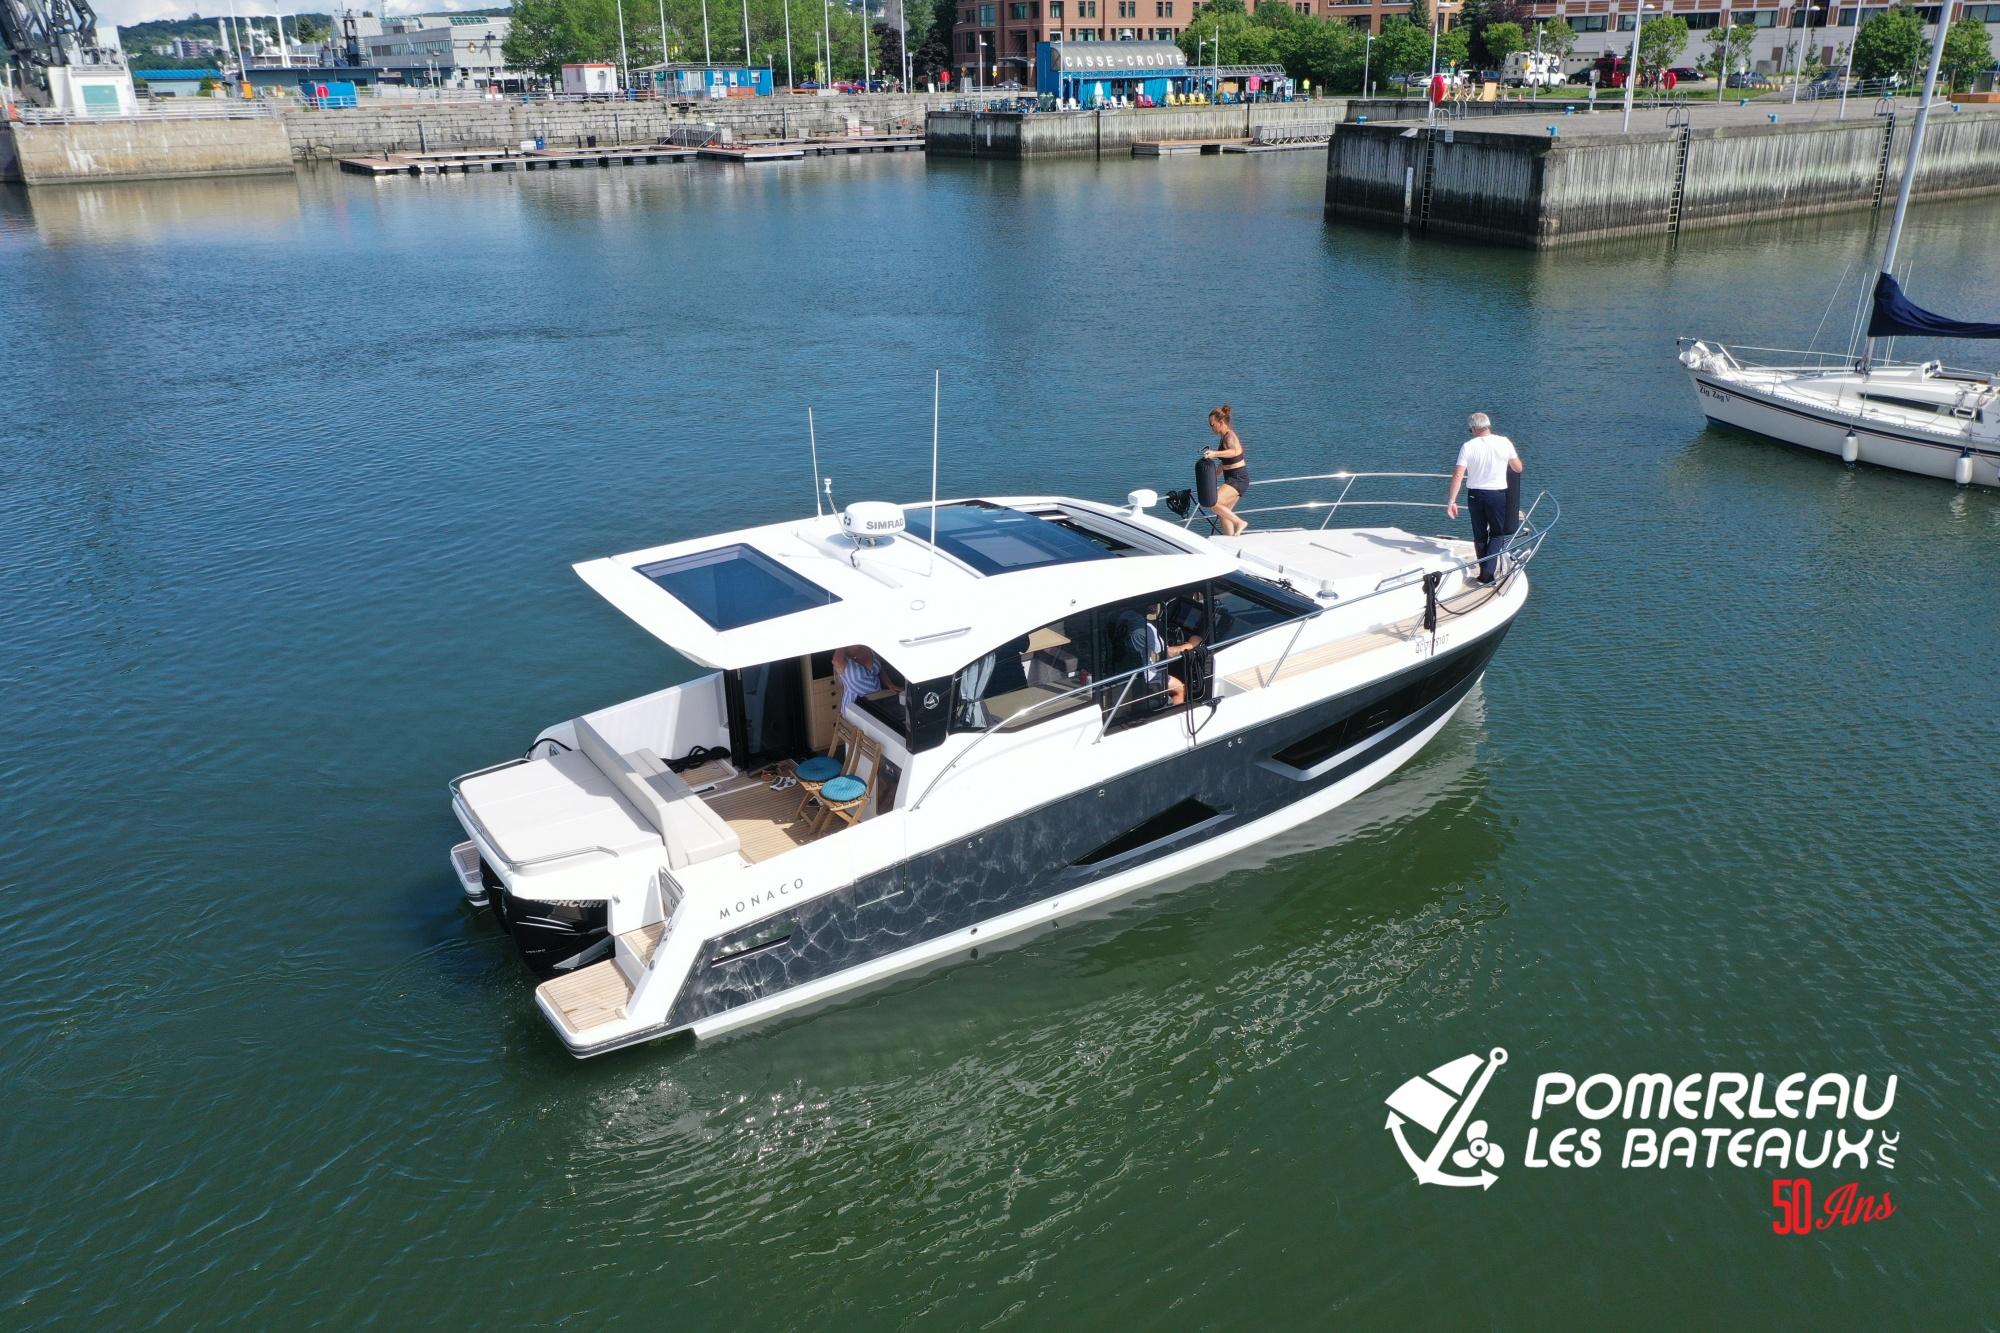 Parker Boats Monaco DEMO - 2CBA109448A8D0B28BDC0CFF2FA30861.jpeg